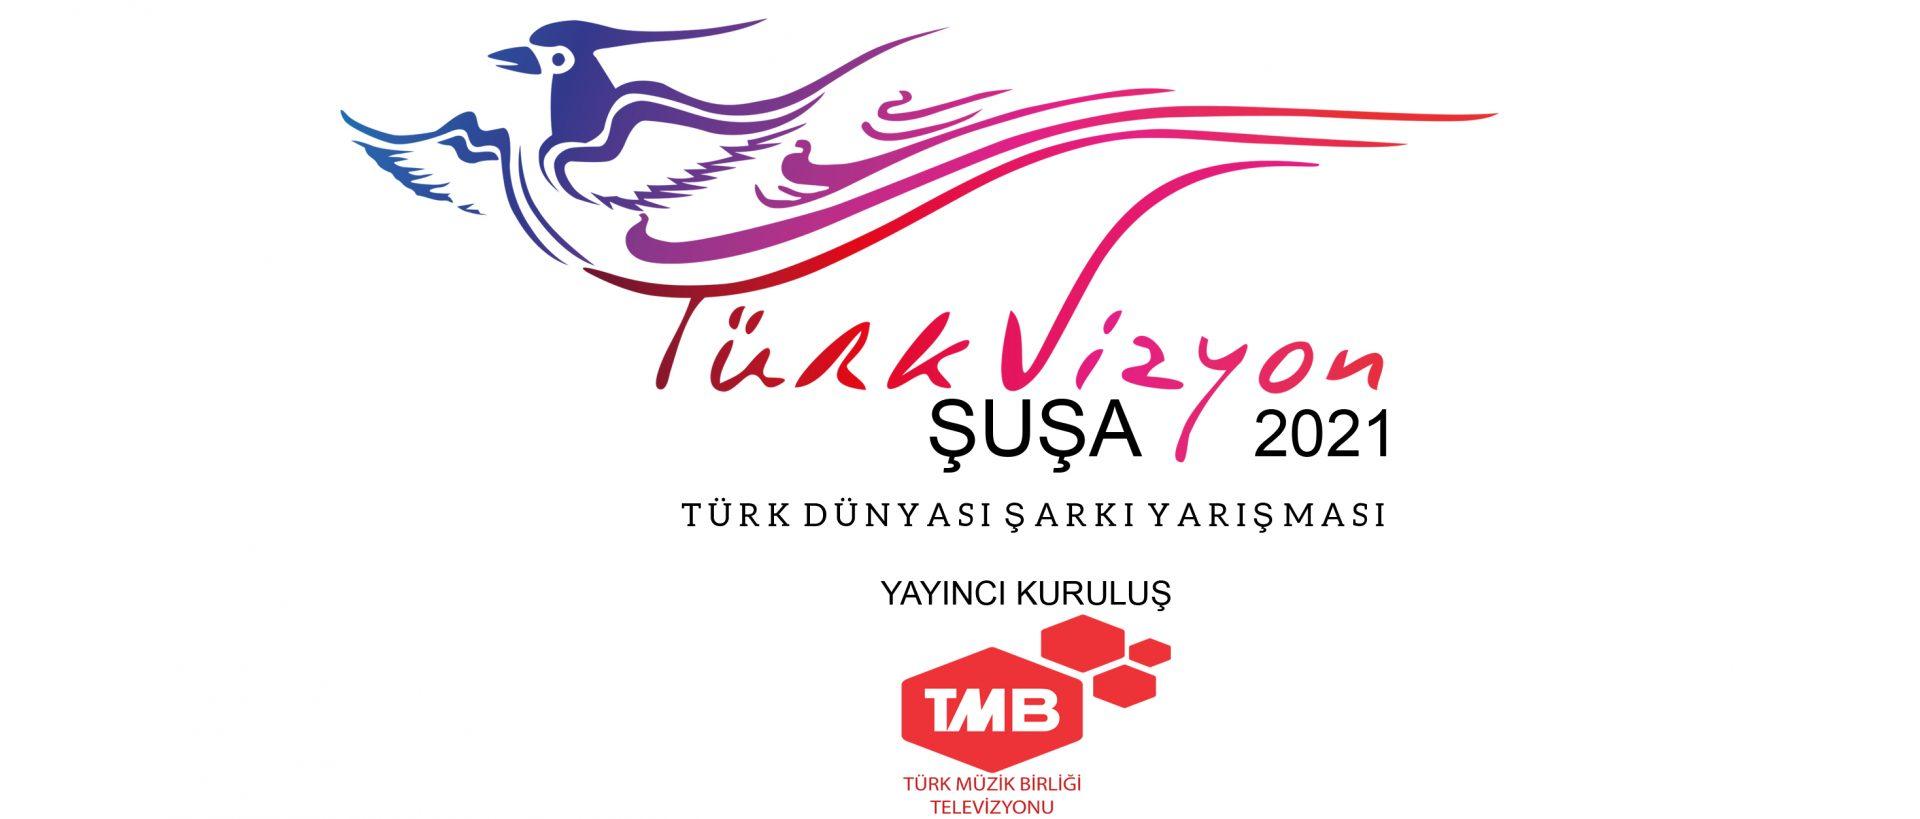 Turkvizyon 2021 Susa Da Gerceklesecek Eurovision Turkey